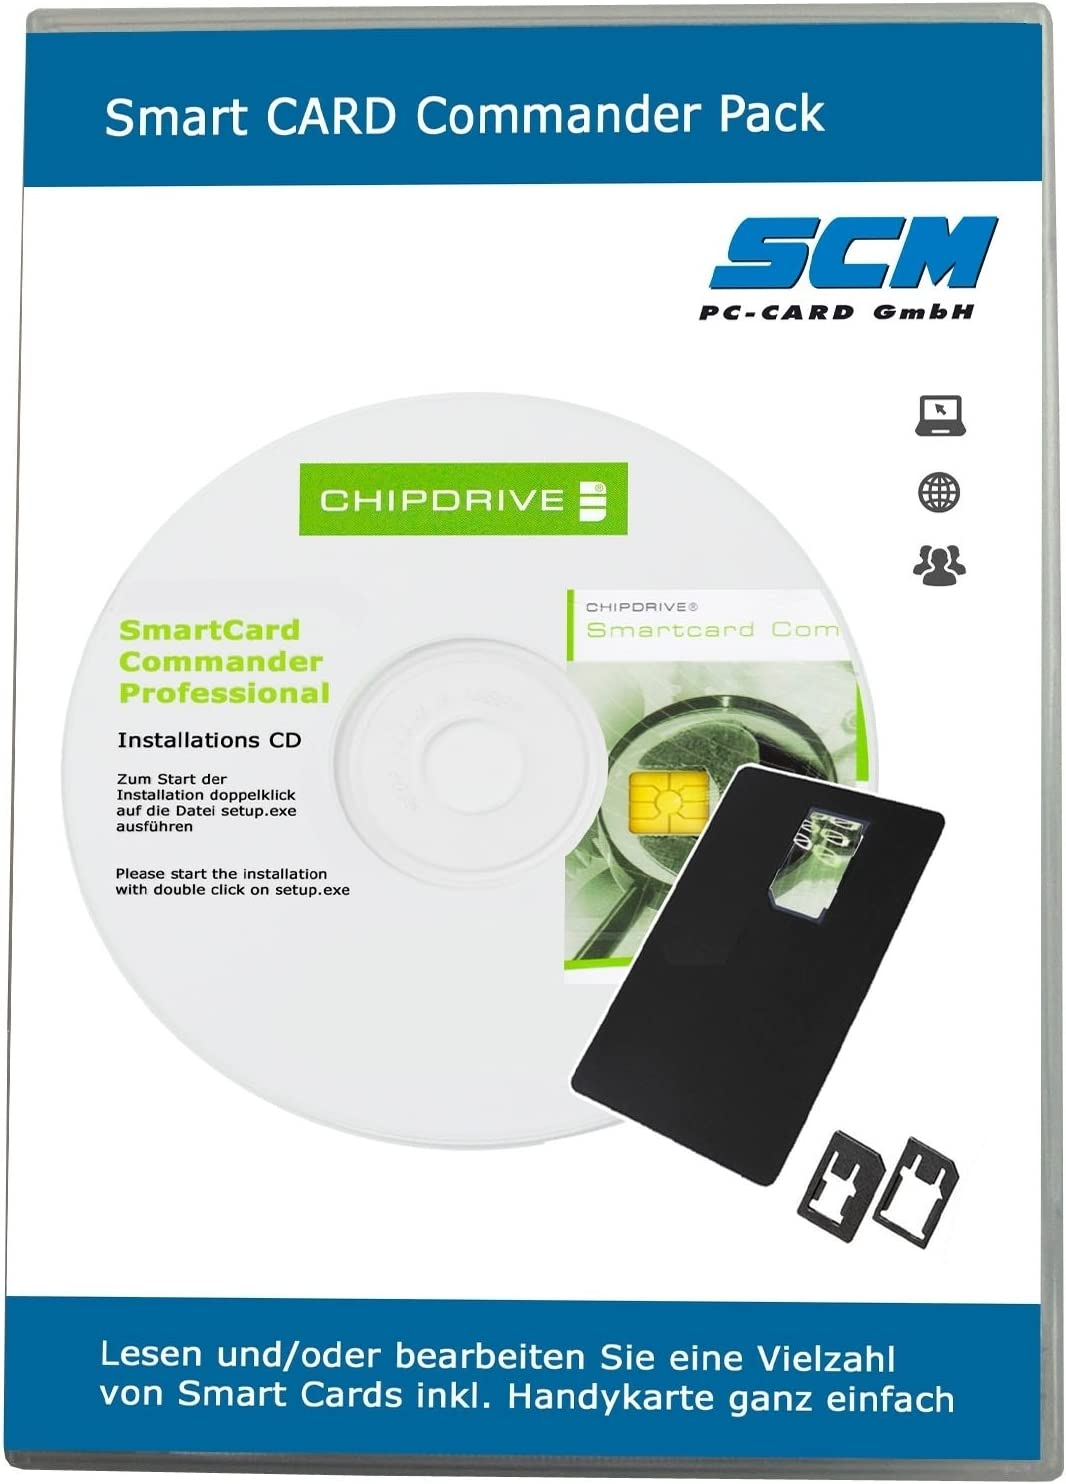 Smart Card Commander Pack - chip Drive Software Smart Card Commander PROF PLUS MINI adaptador de tarjeta SIM: Amazon.es: Informática